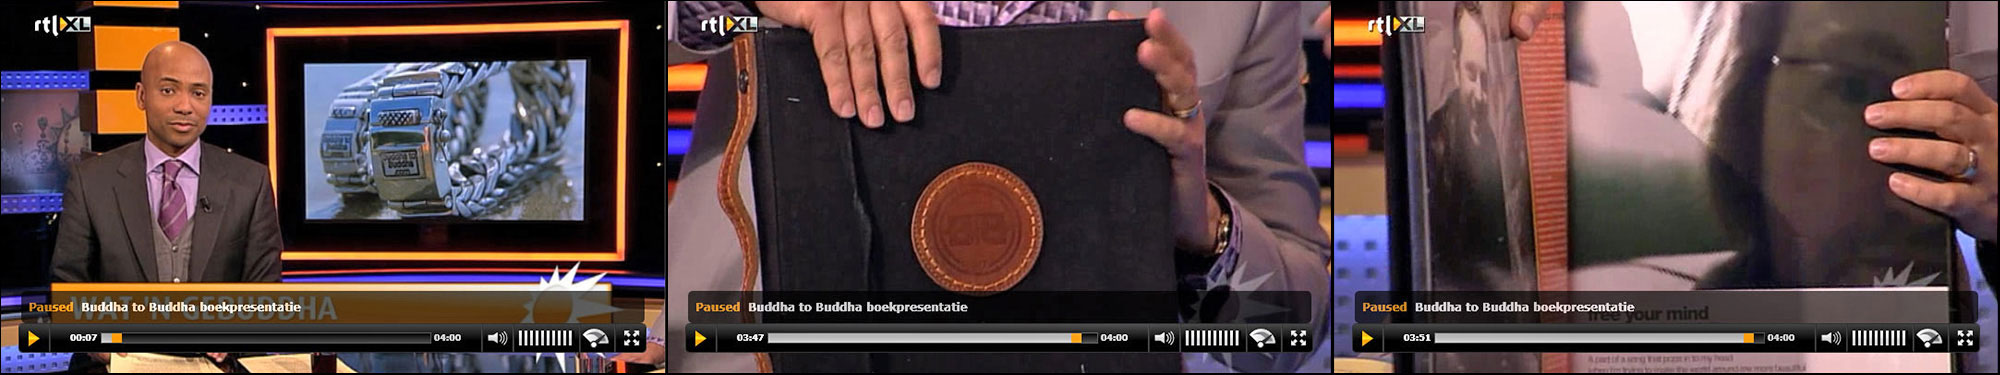 Buddha to Buddha - book on TV